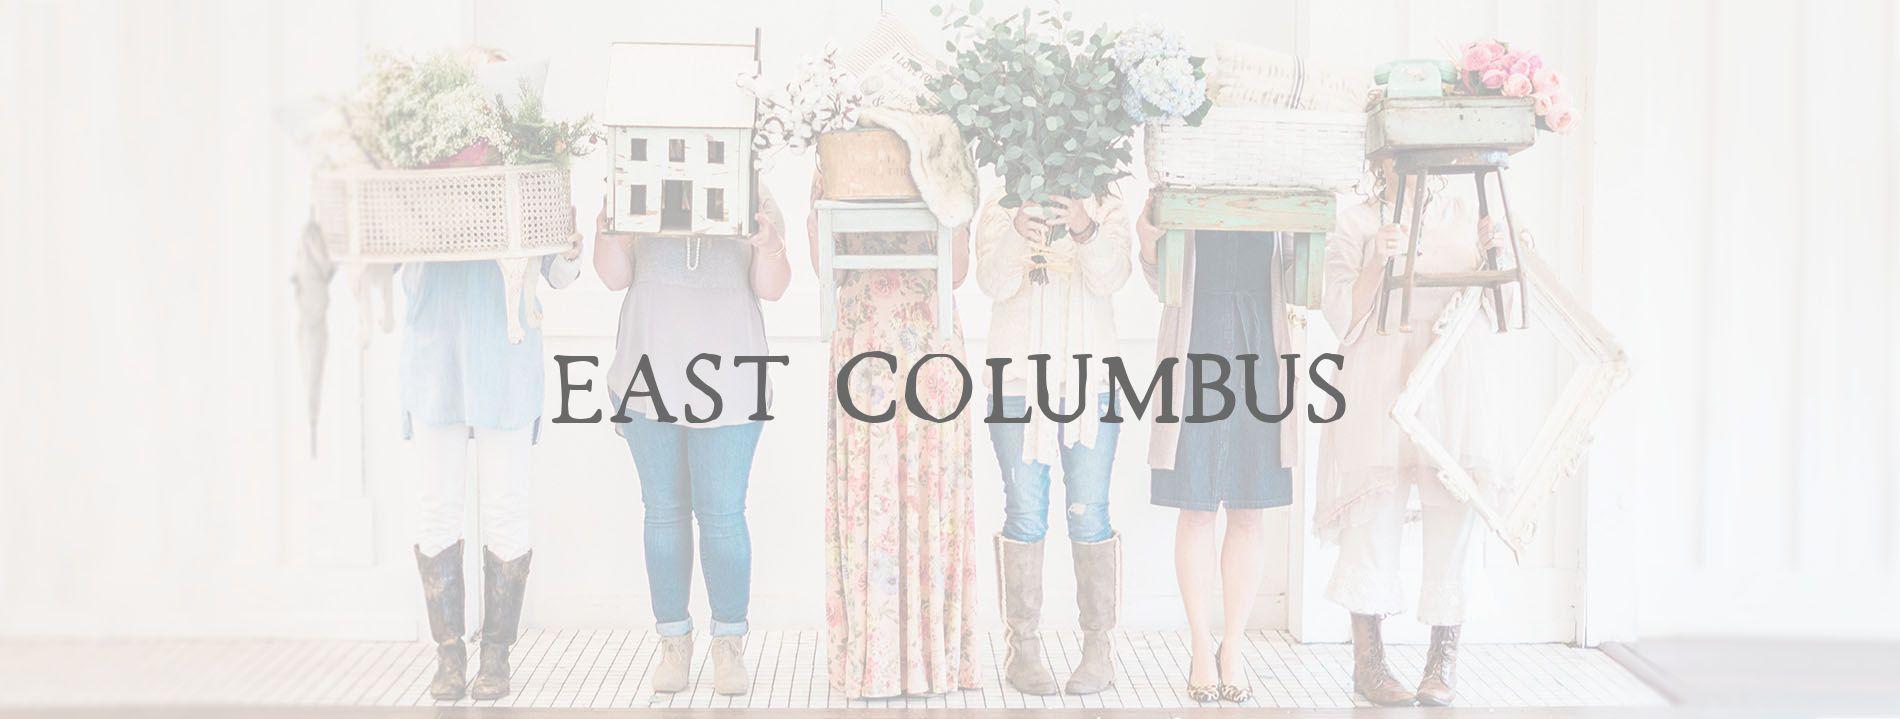 East Columbus